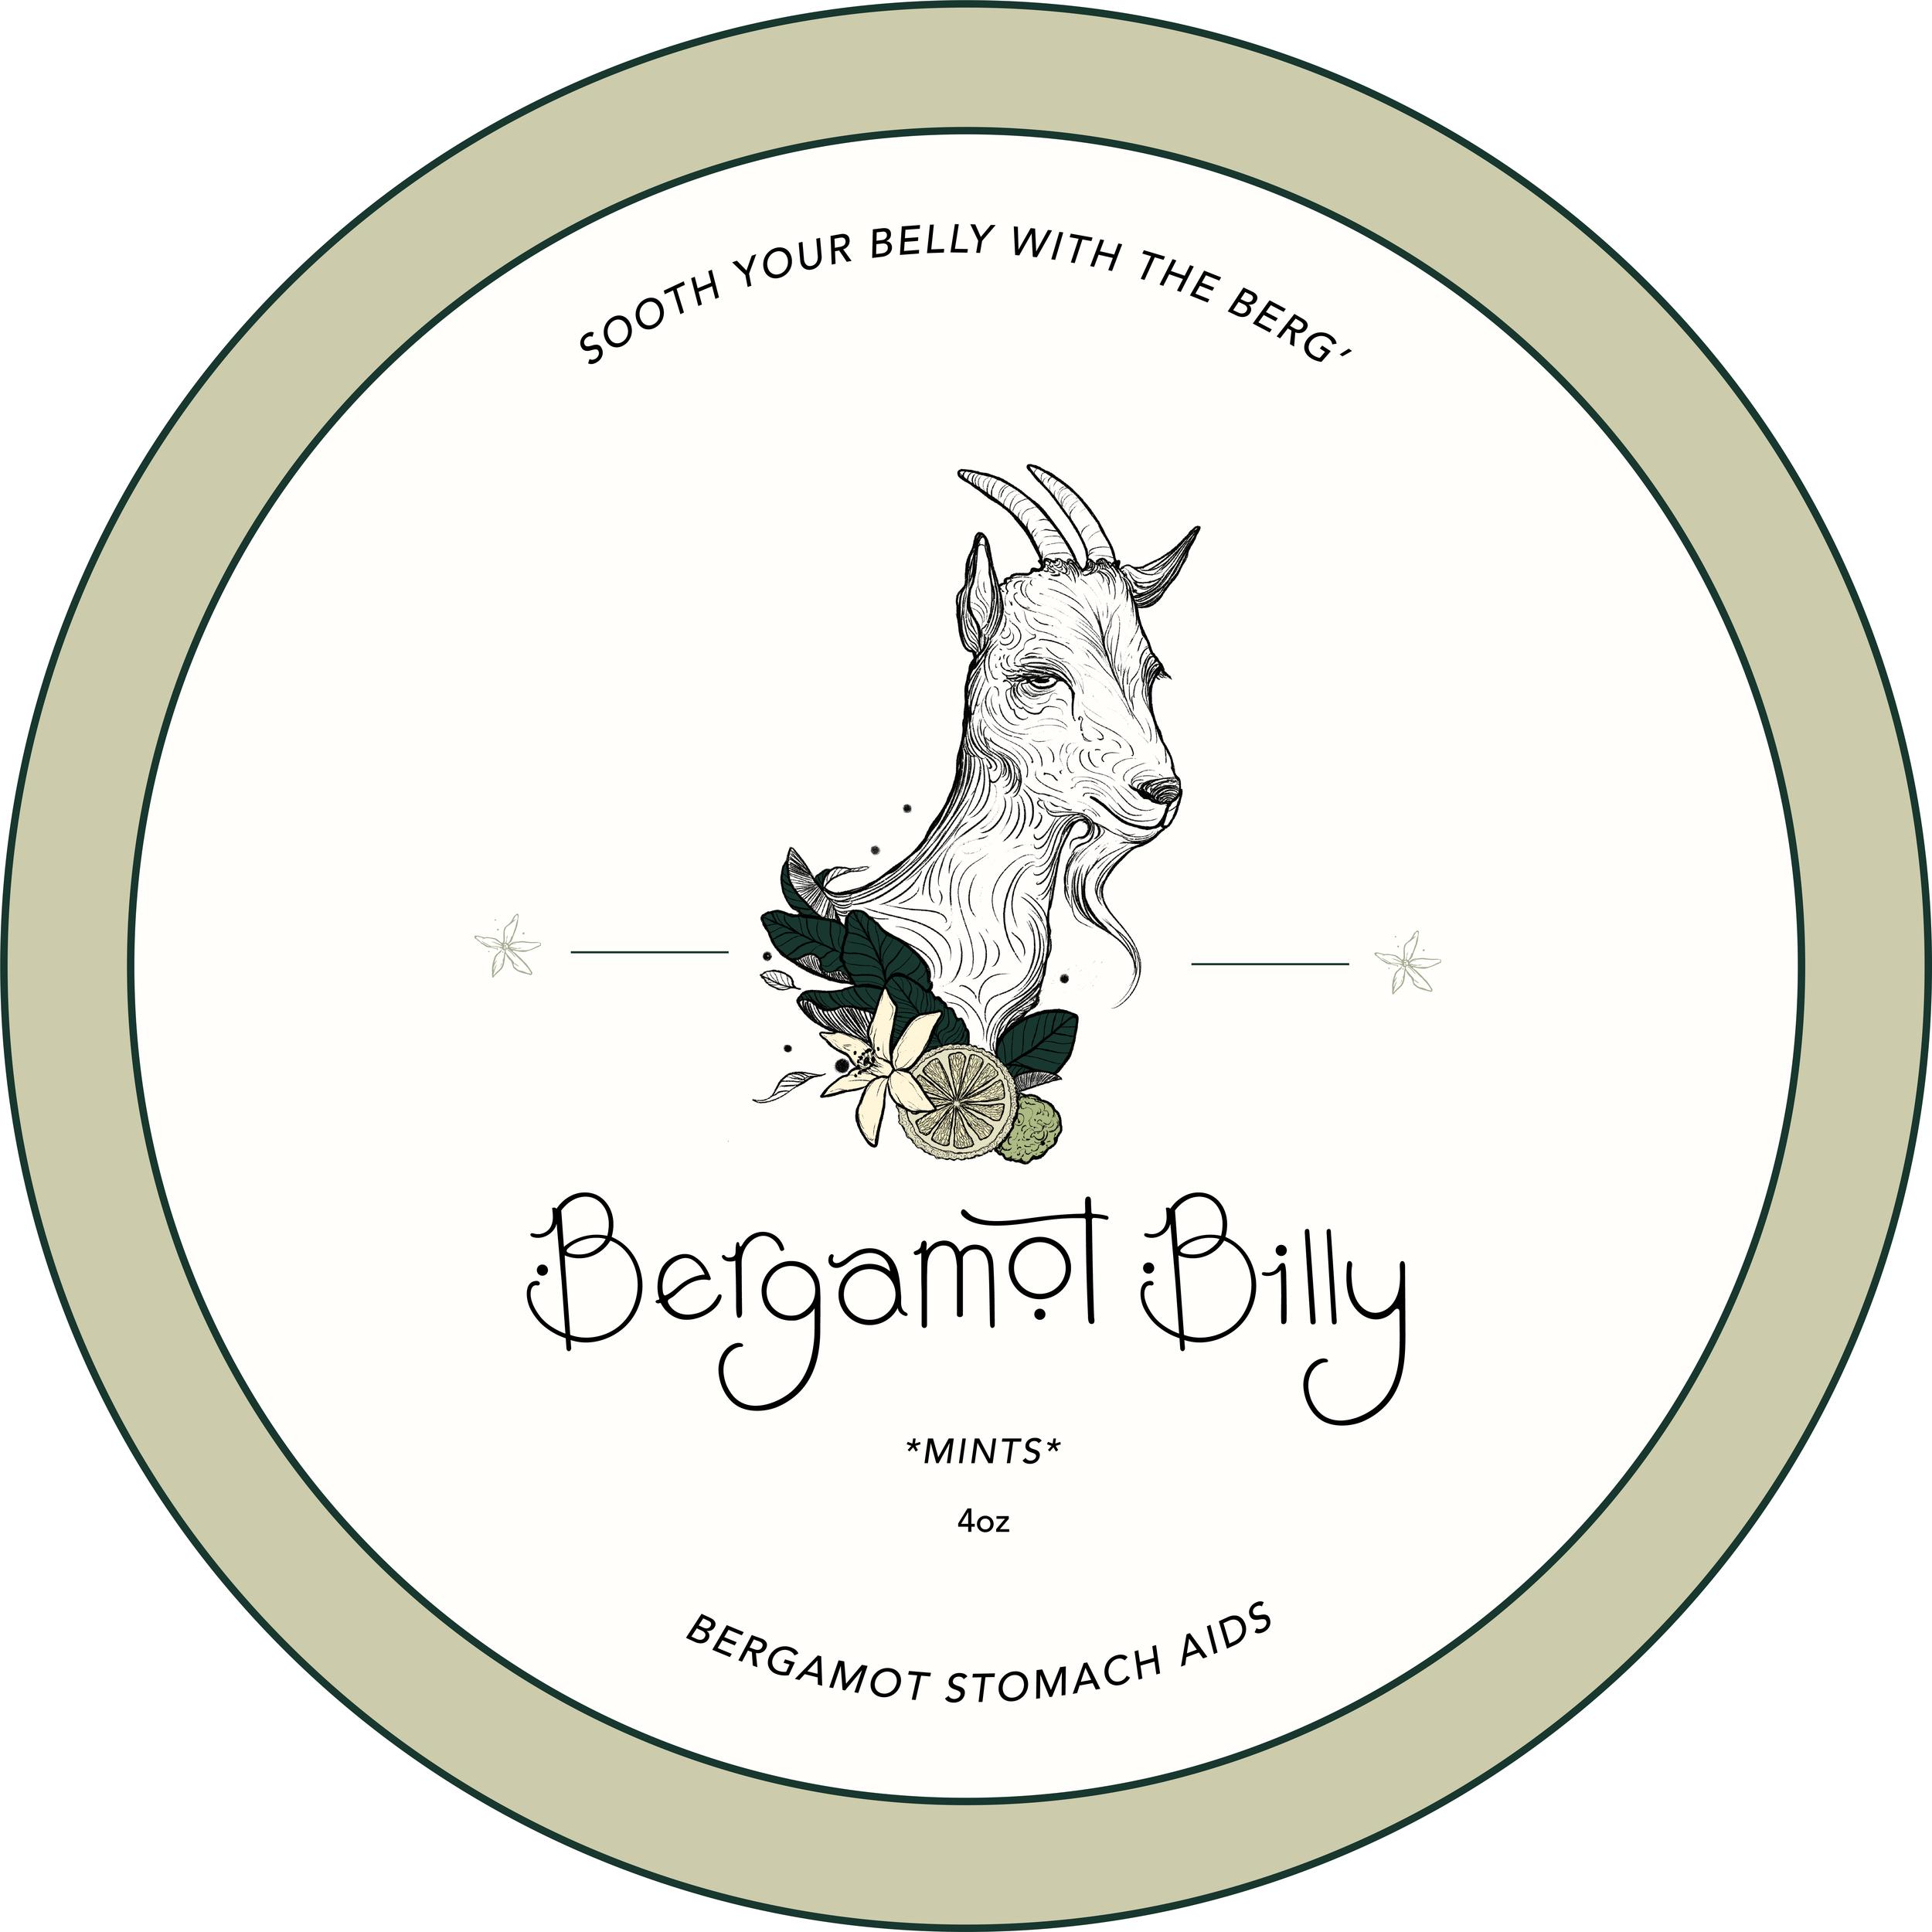 berg logo billly-13.png